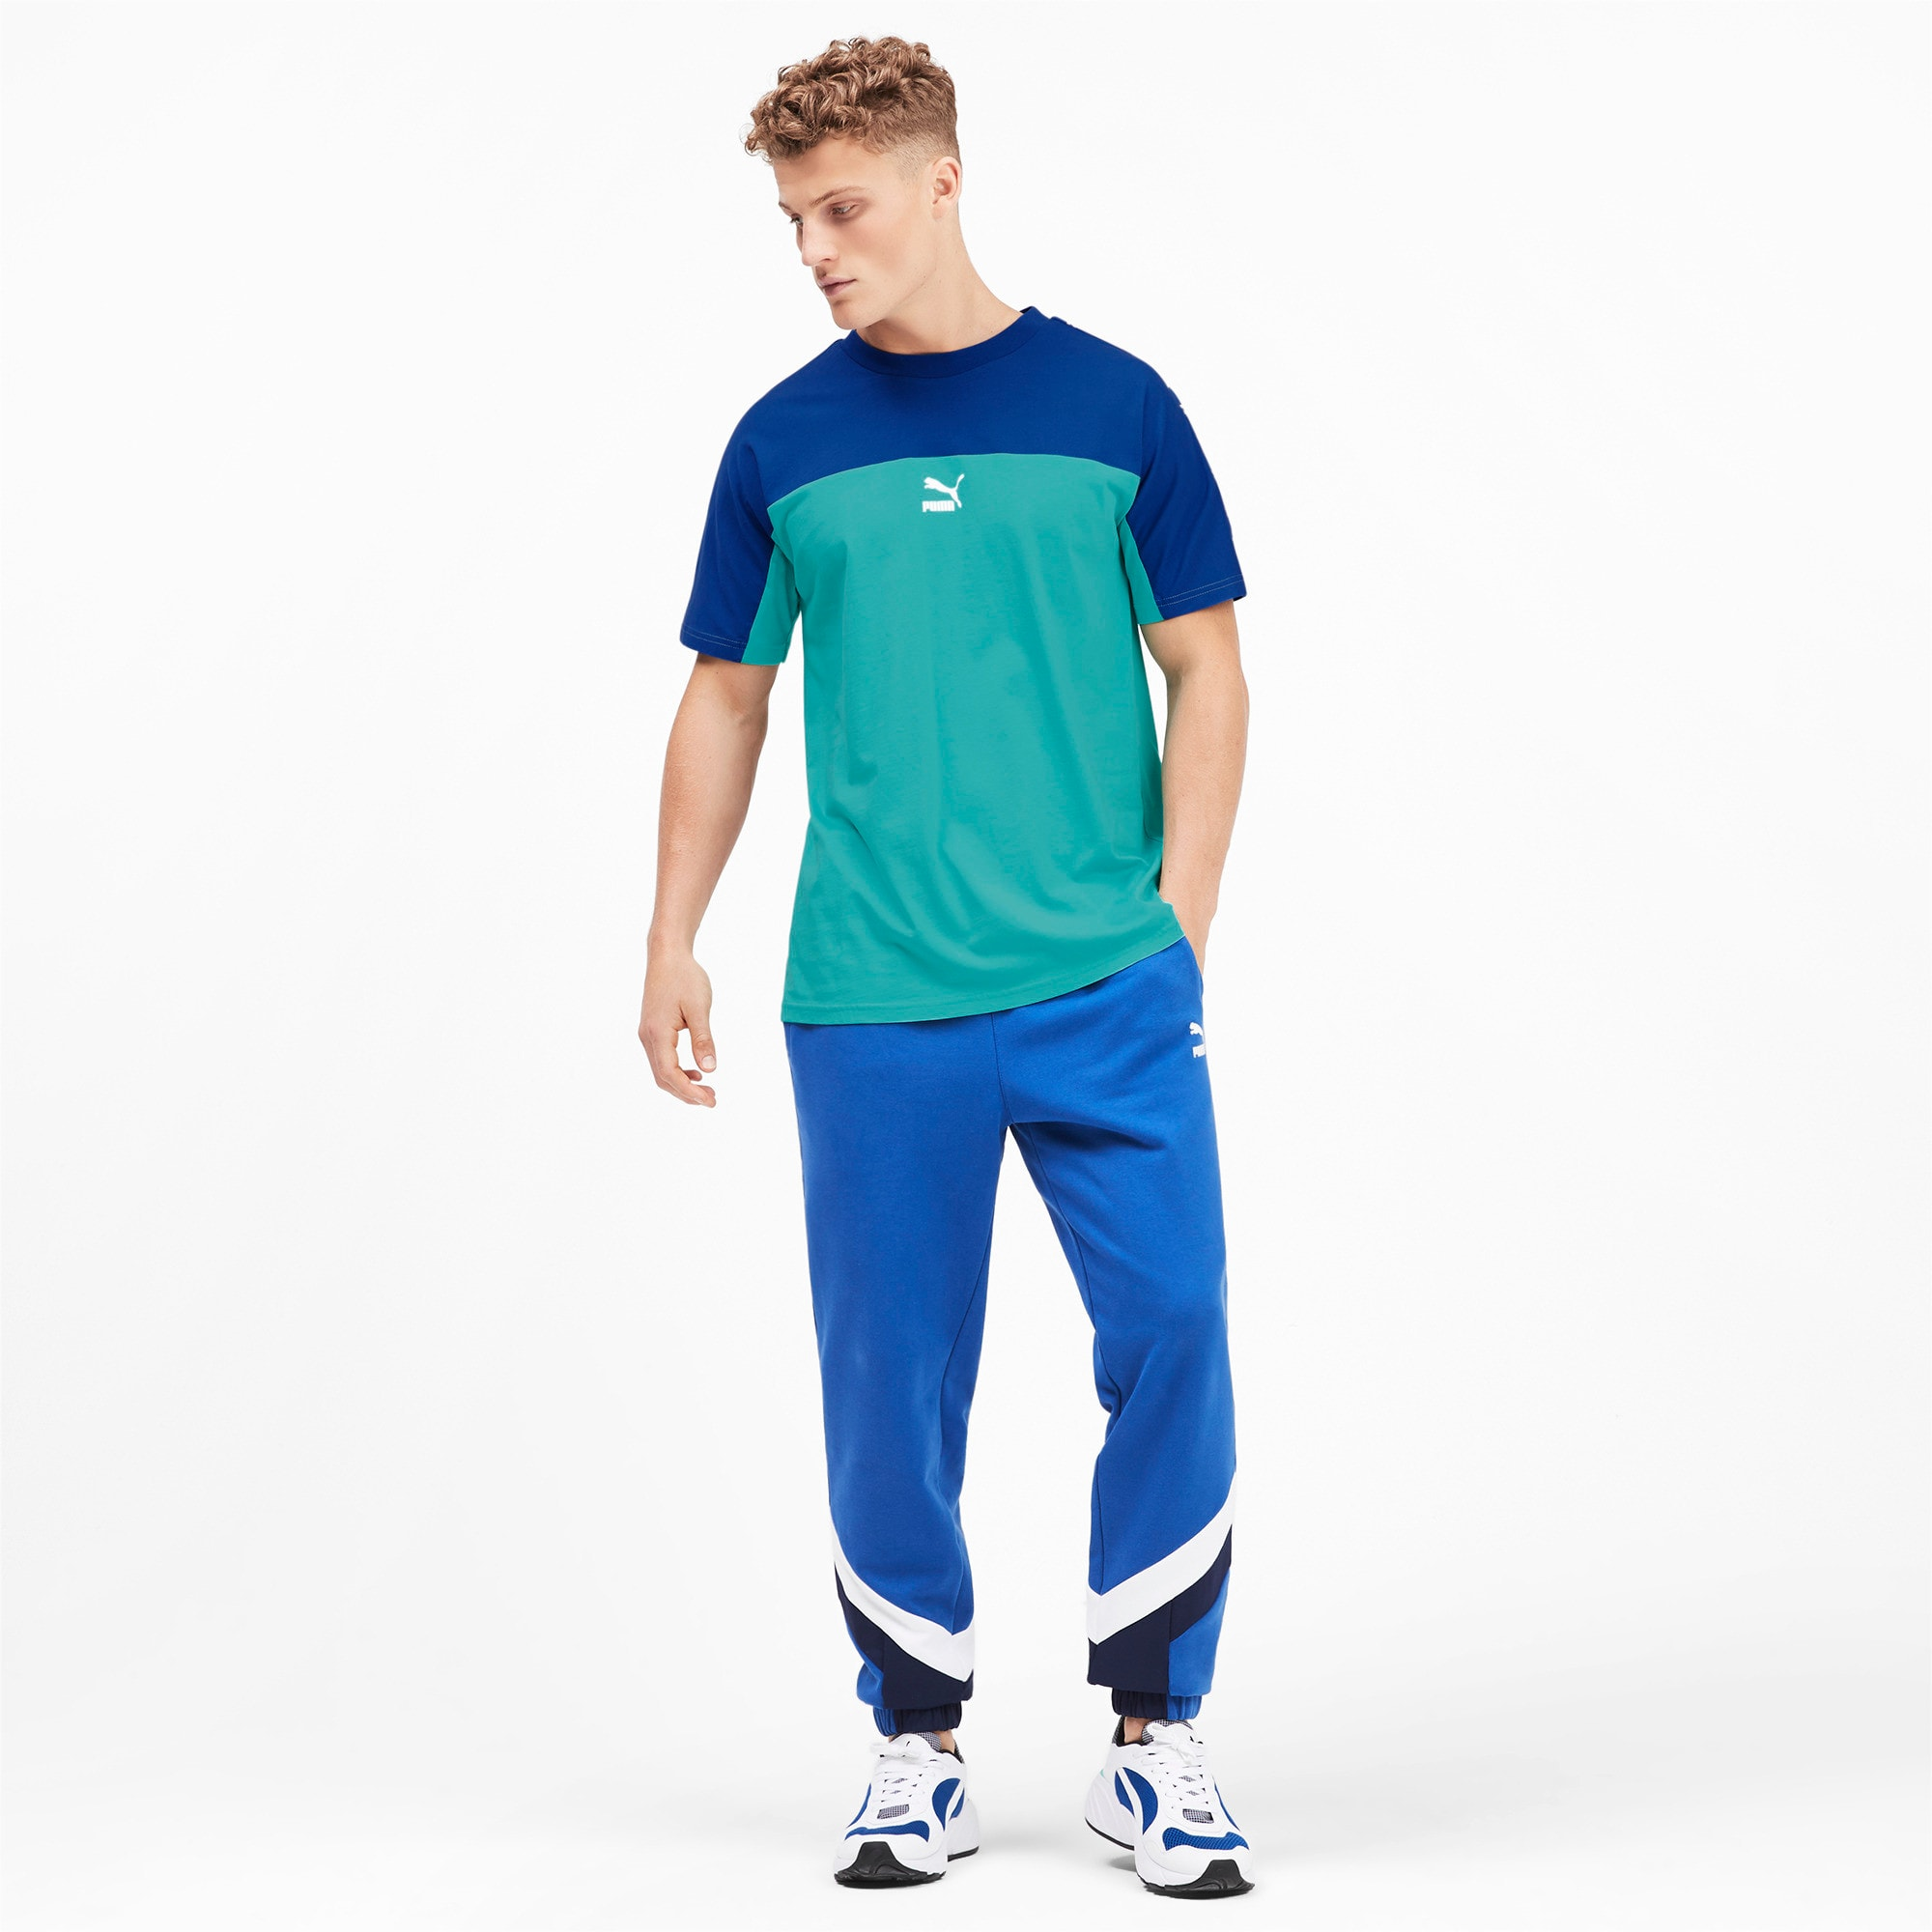 Thumbnail 4 of PUMA XTG SS Tシャツ 半袖, Blue Turquoise, medium-JPN